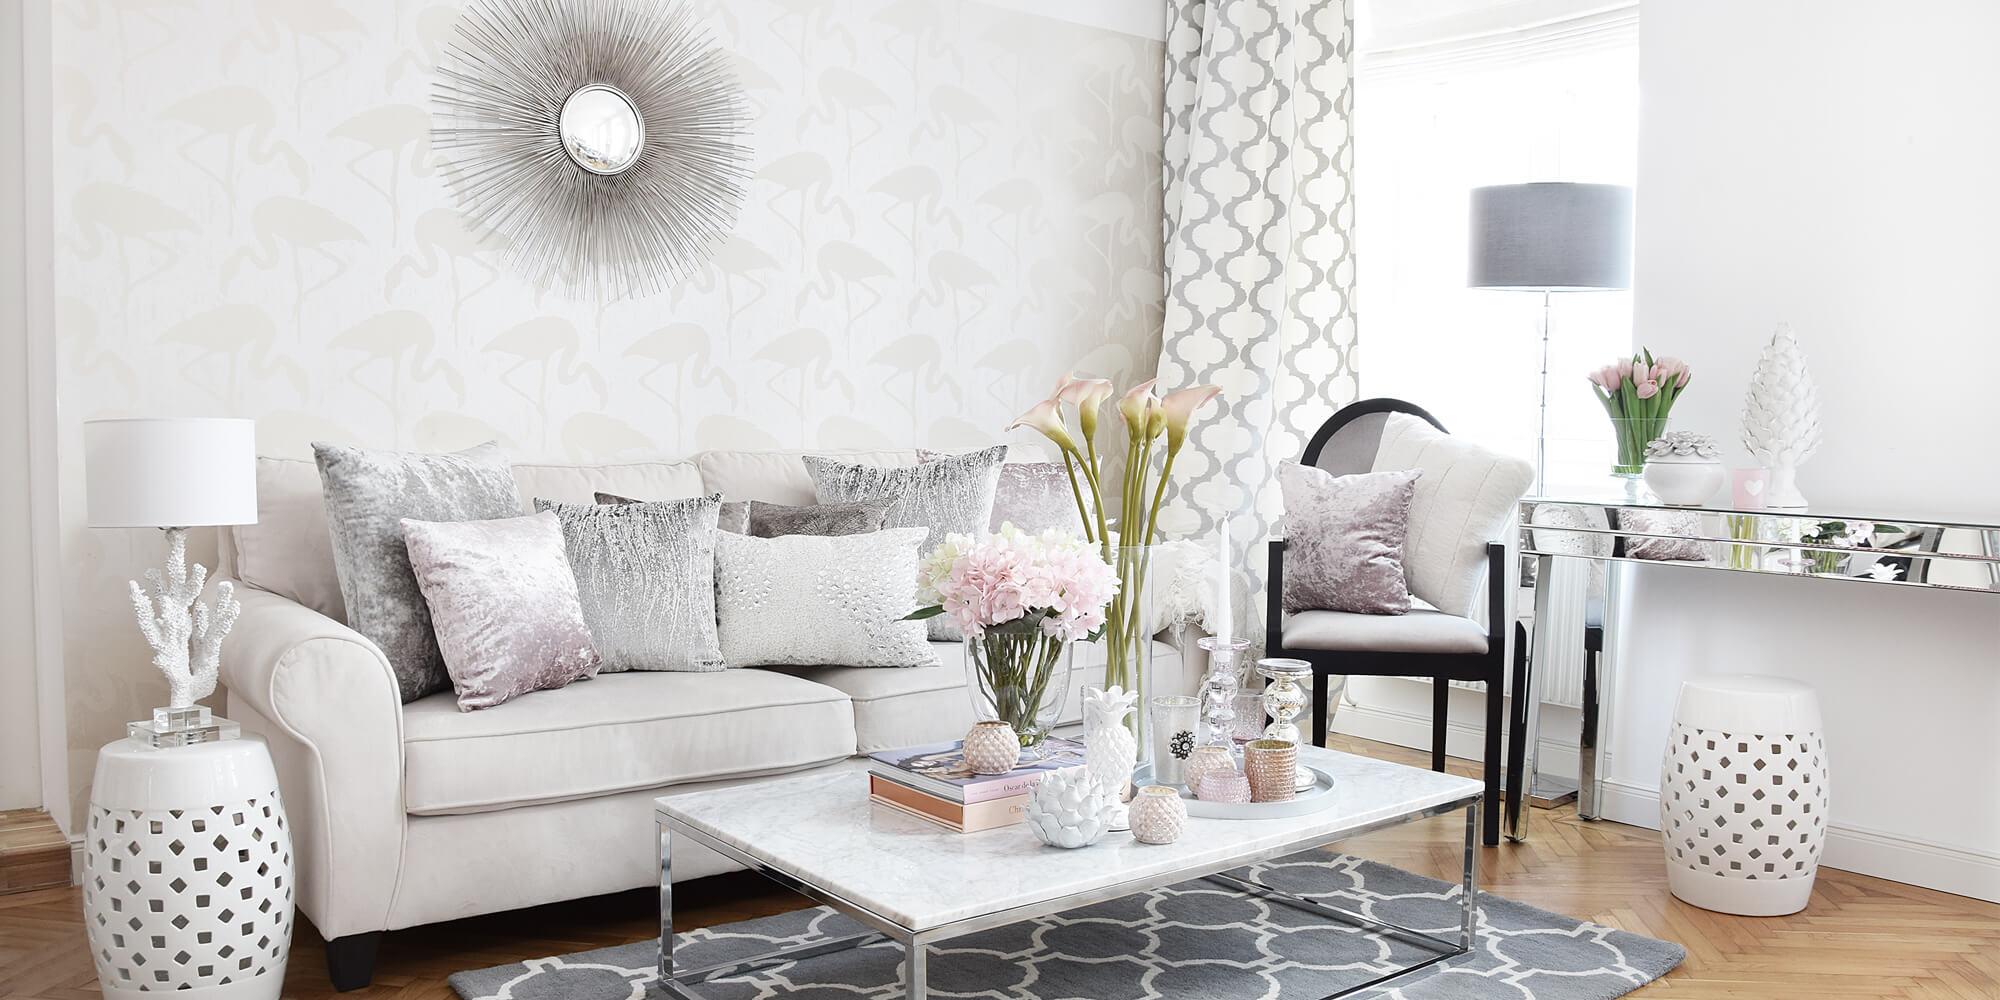 Wohnzimmer Weis Rosa  homeautodesigncom